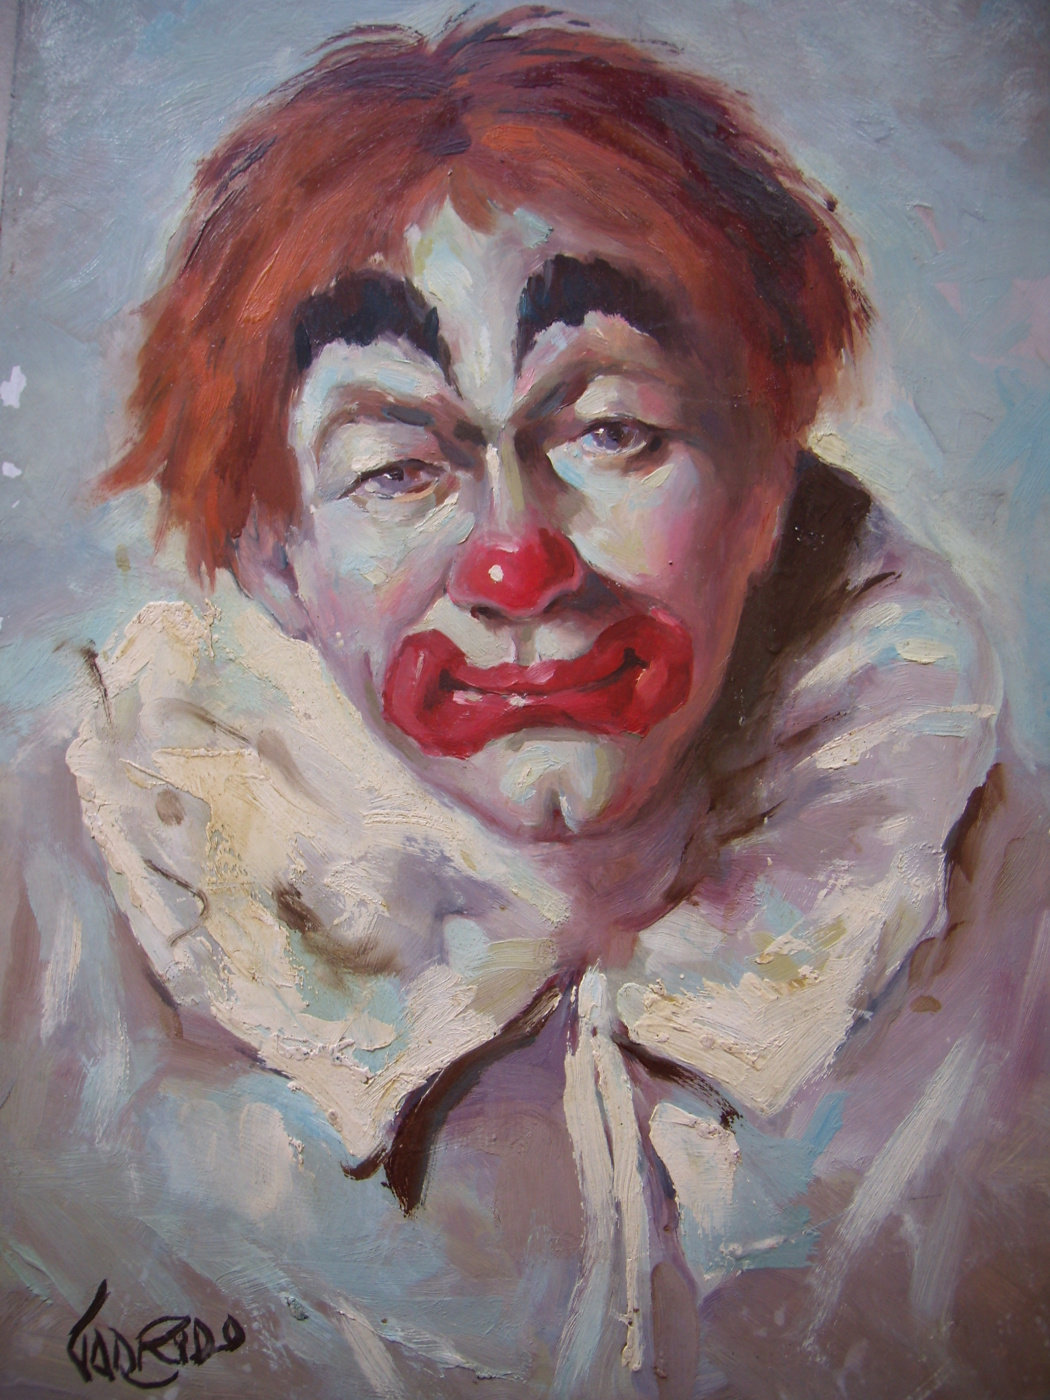 Unknown artist. Грустный клоун.